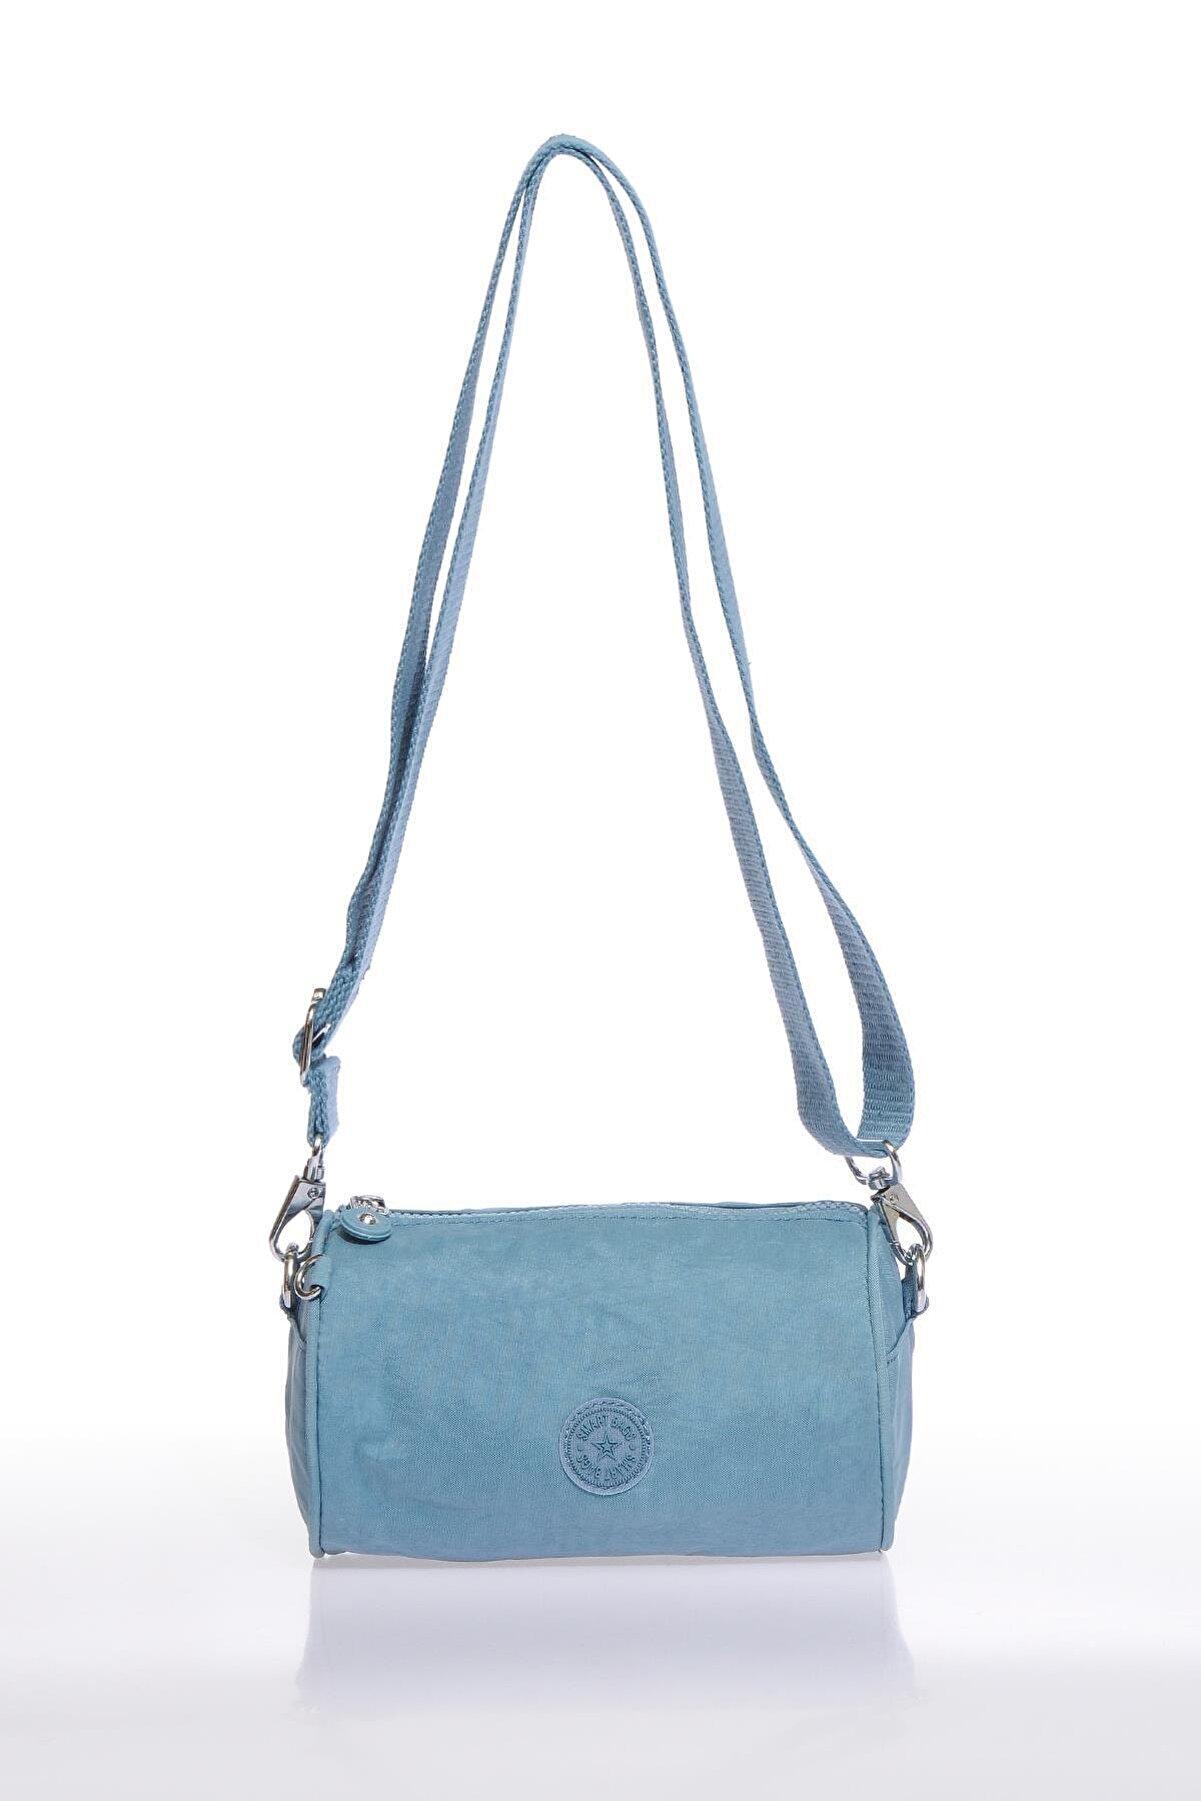 Smart Bags Smb3025-0050 Buz Mavi Kadın Çapraz Çanta